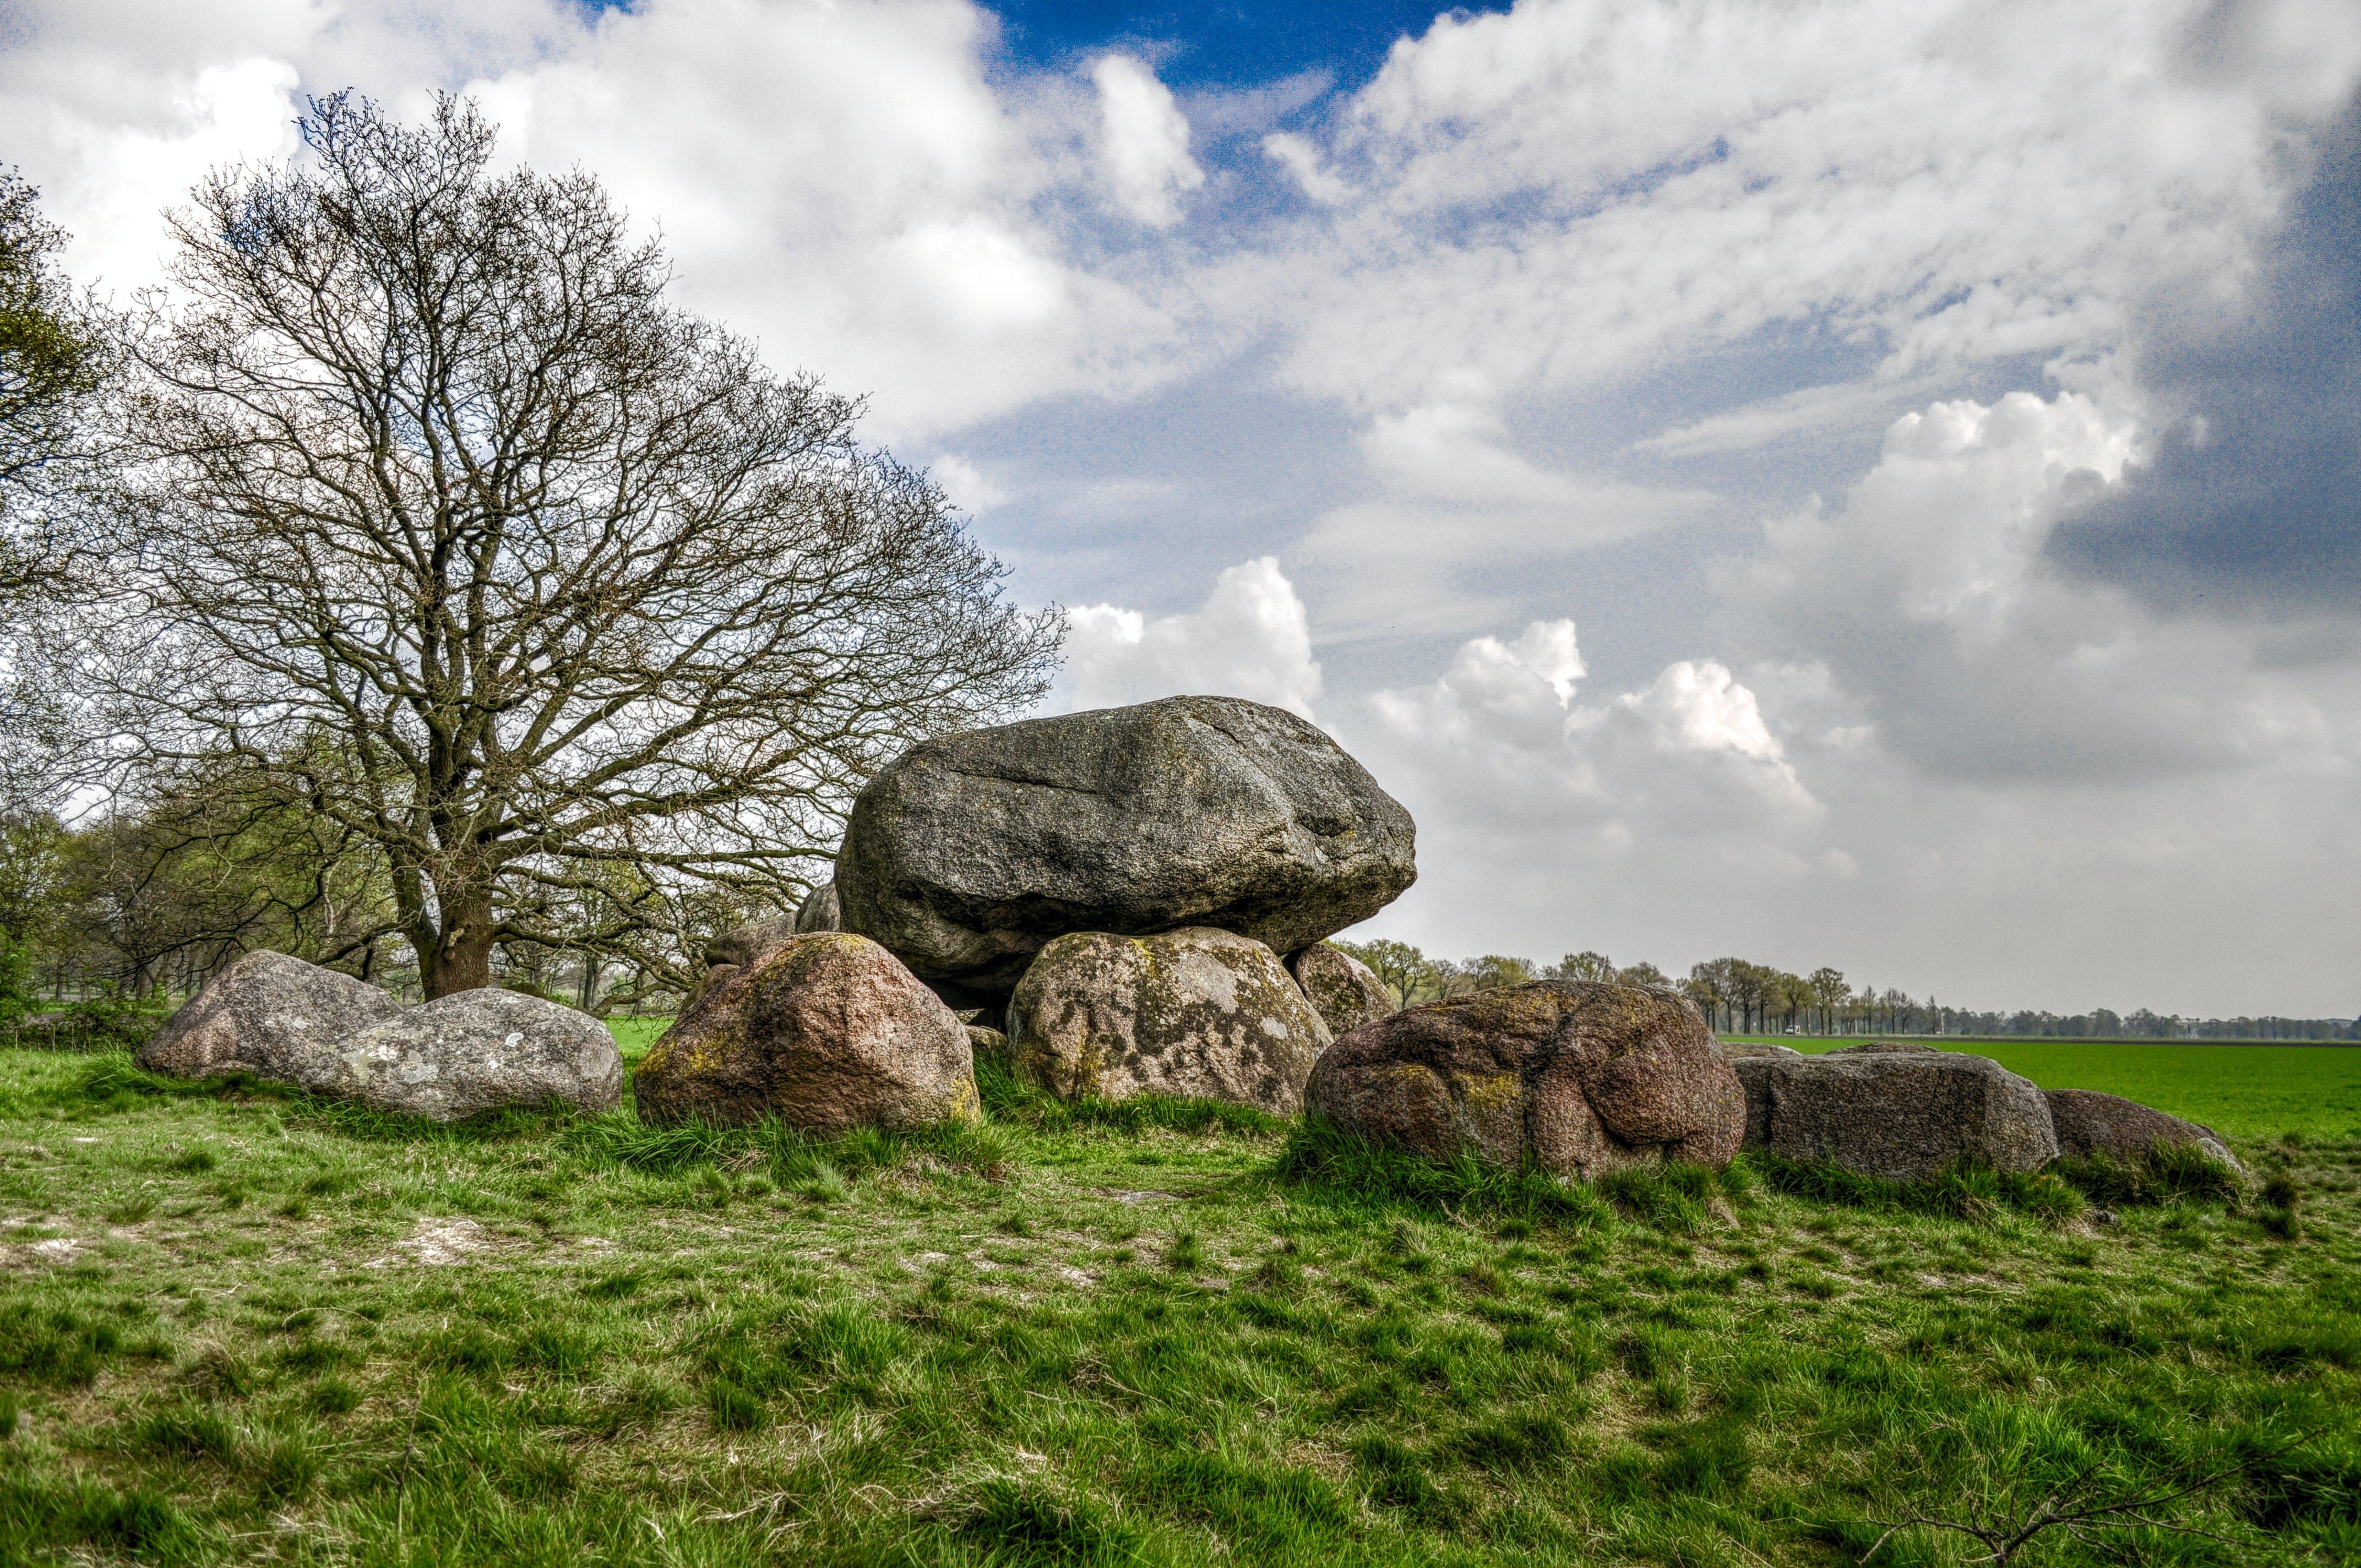 Brown Rocks Near Bare Tree